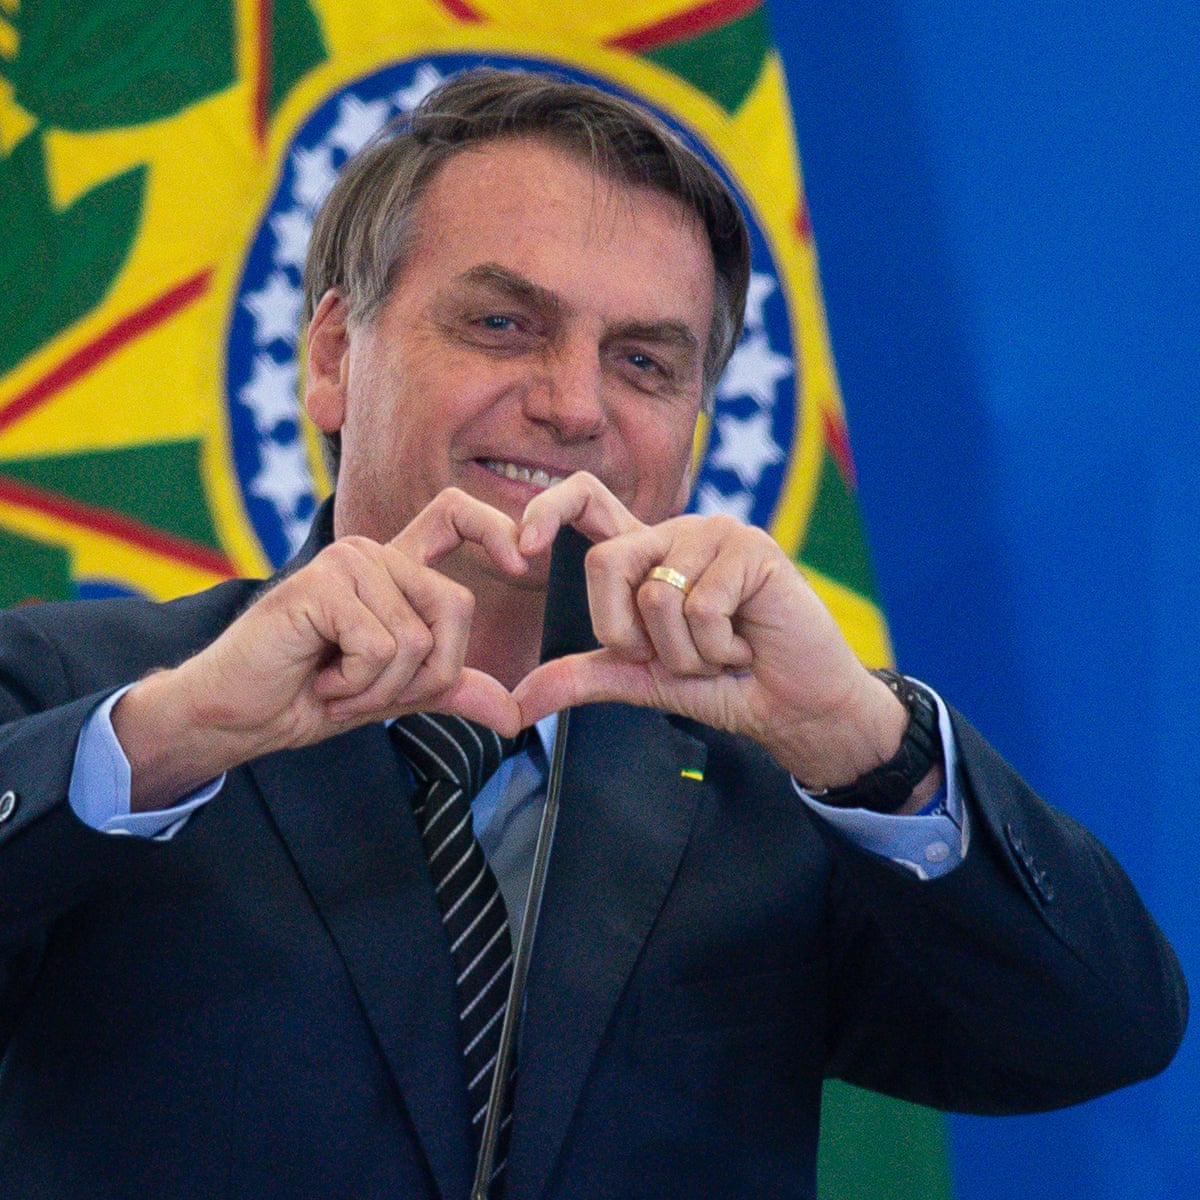 Outrage as Jair Bolsonaro appears to endorse Brazil anti-democracy protests  | Jair Bolsonaro | The Guardian